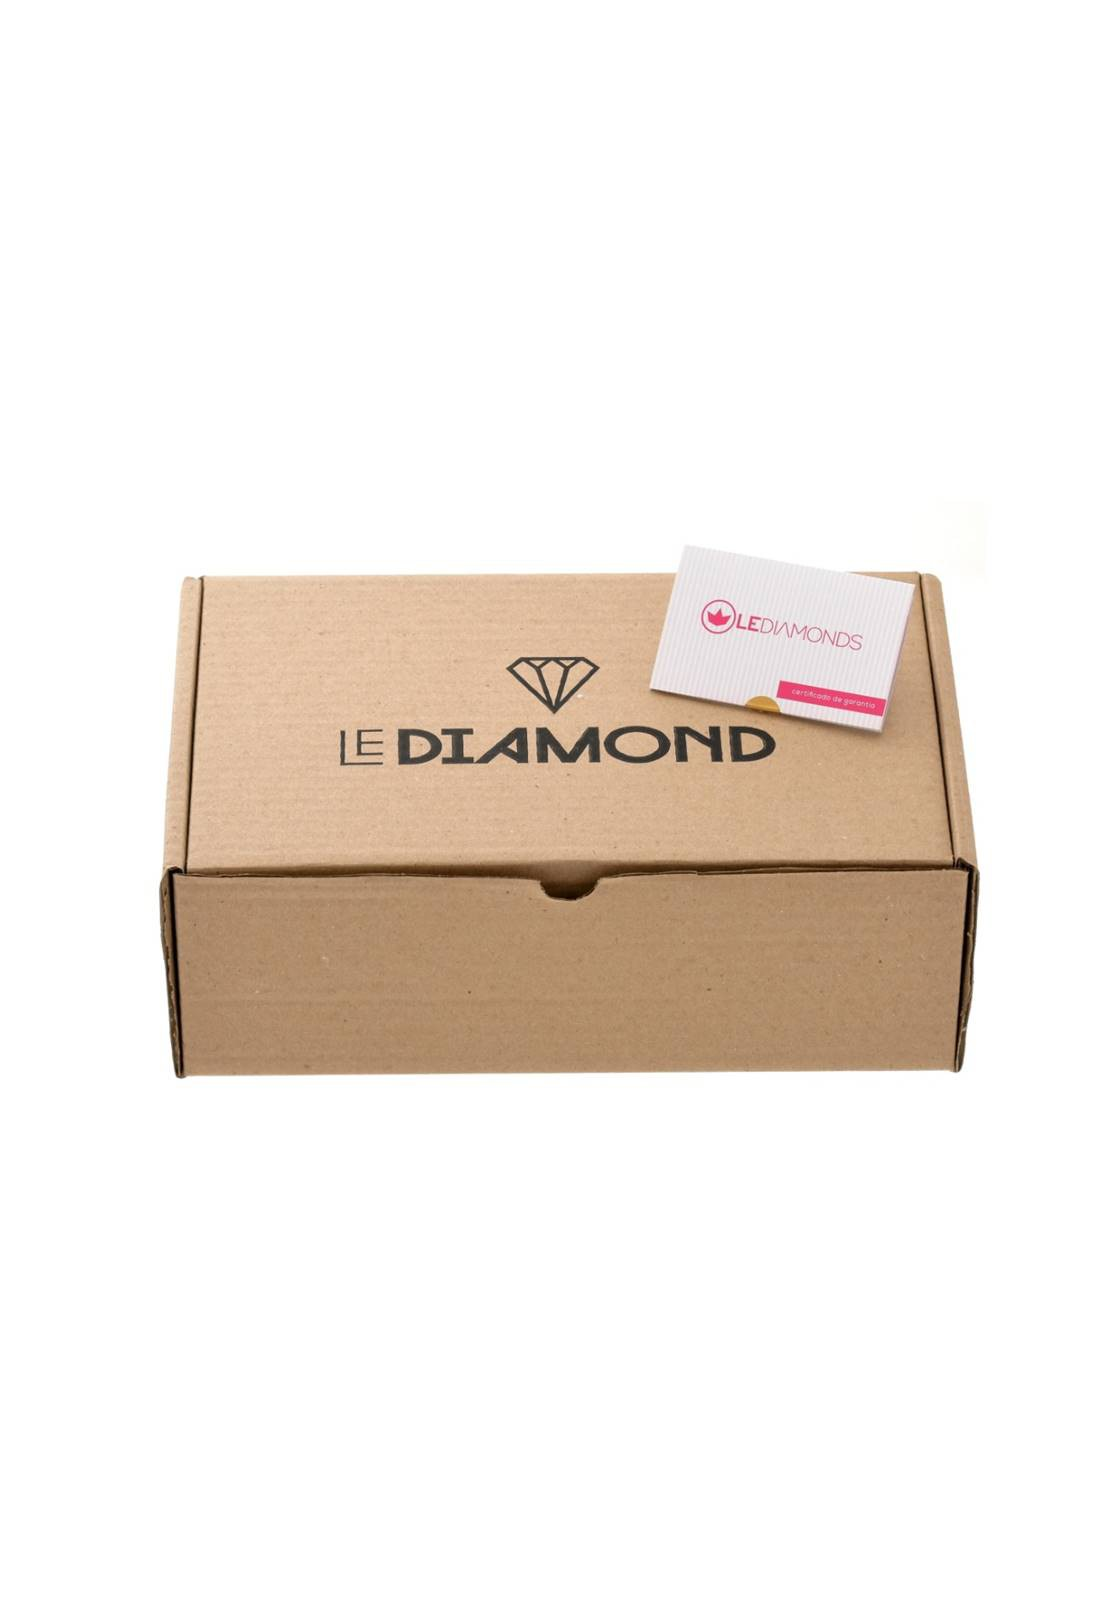 Brinco Le Diamond de Franja com Base Acrílico Preto